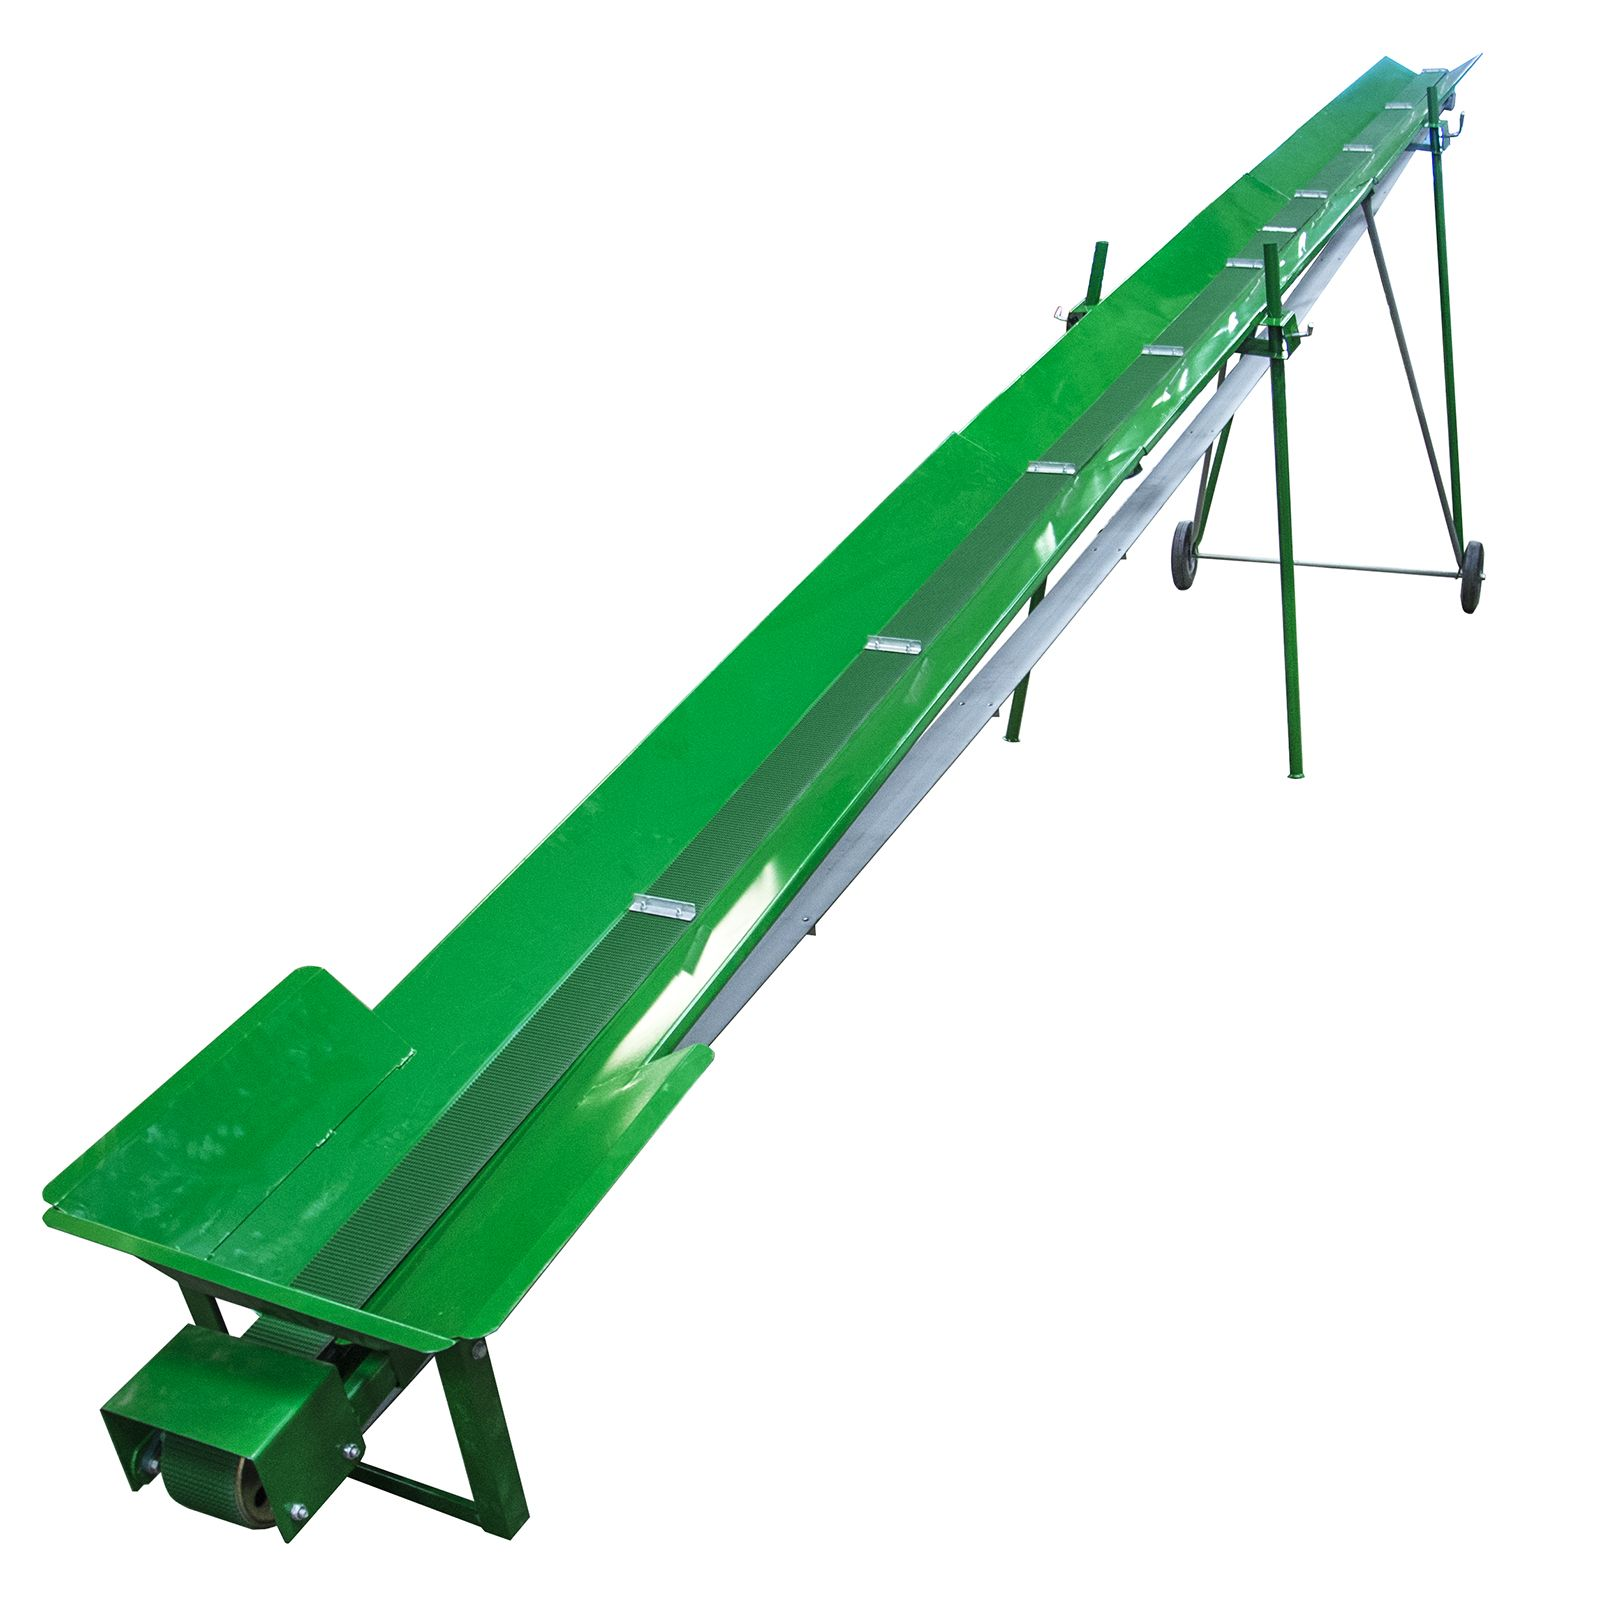 7.5m Log ConveyorLearn More